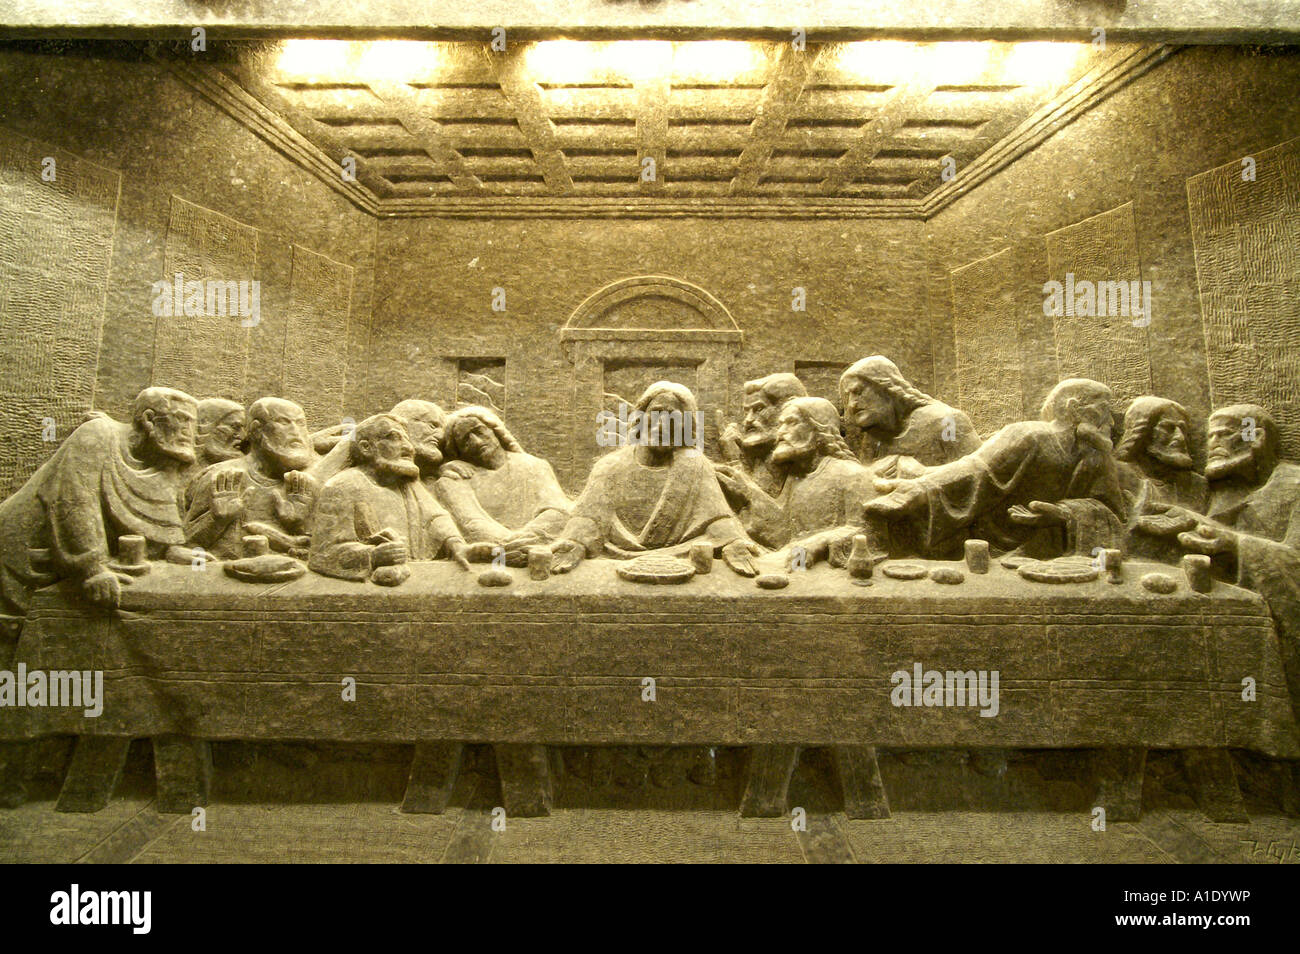 Kopalnia solna Wieliczka salt mine, Last Supper sculptures in St ...